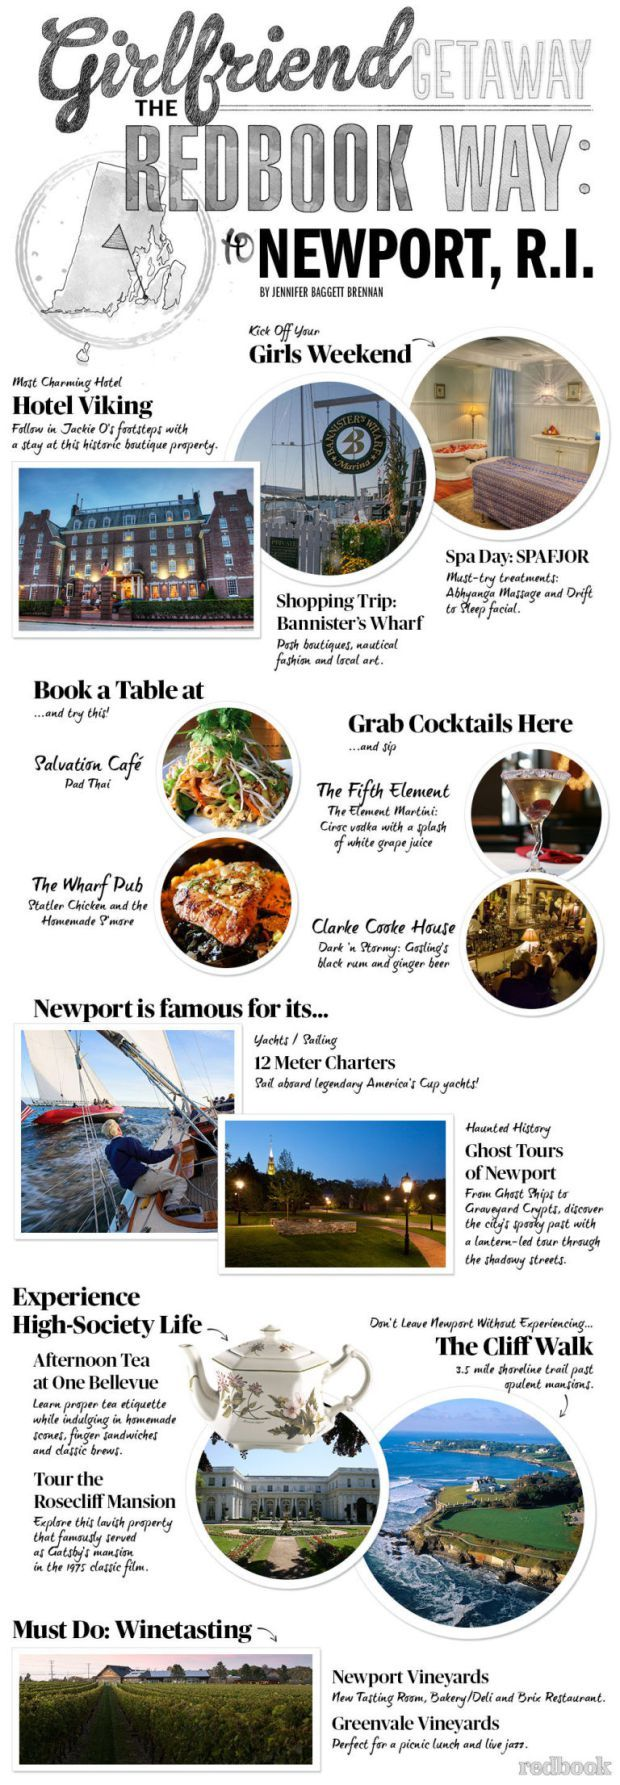 The Ultimate Girlfriend Getaway in #NewportRI, according to @redbookmagazine